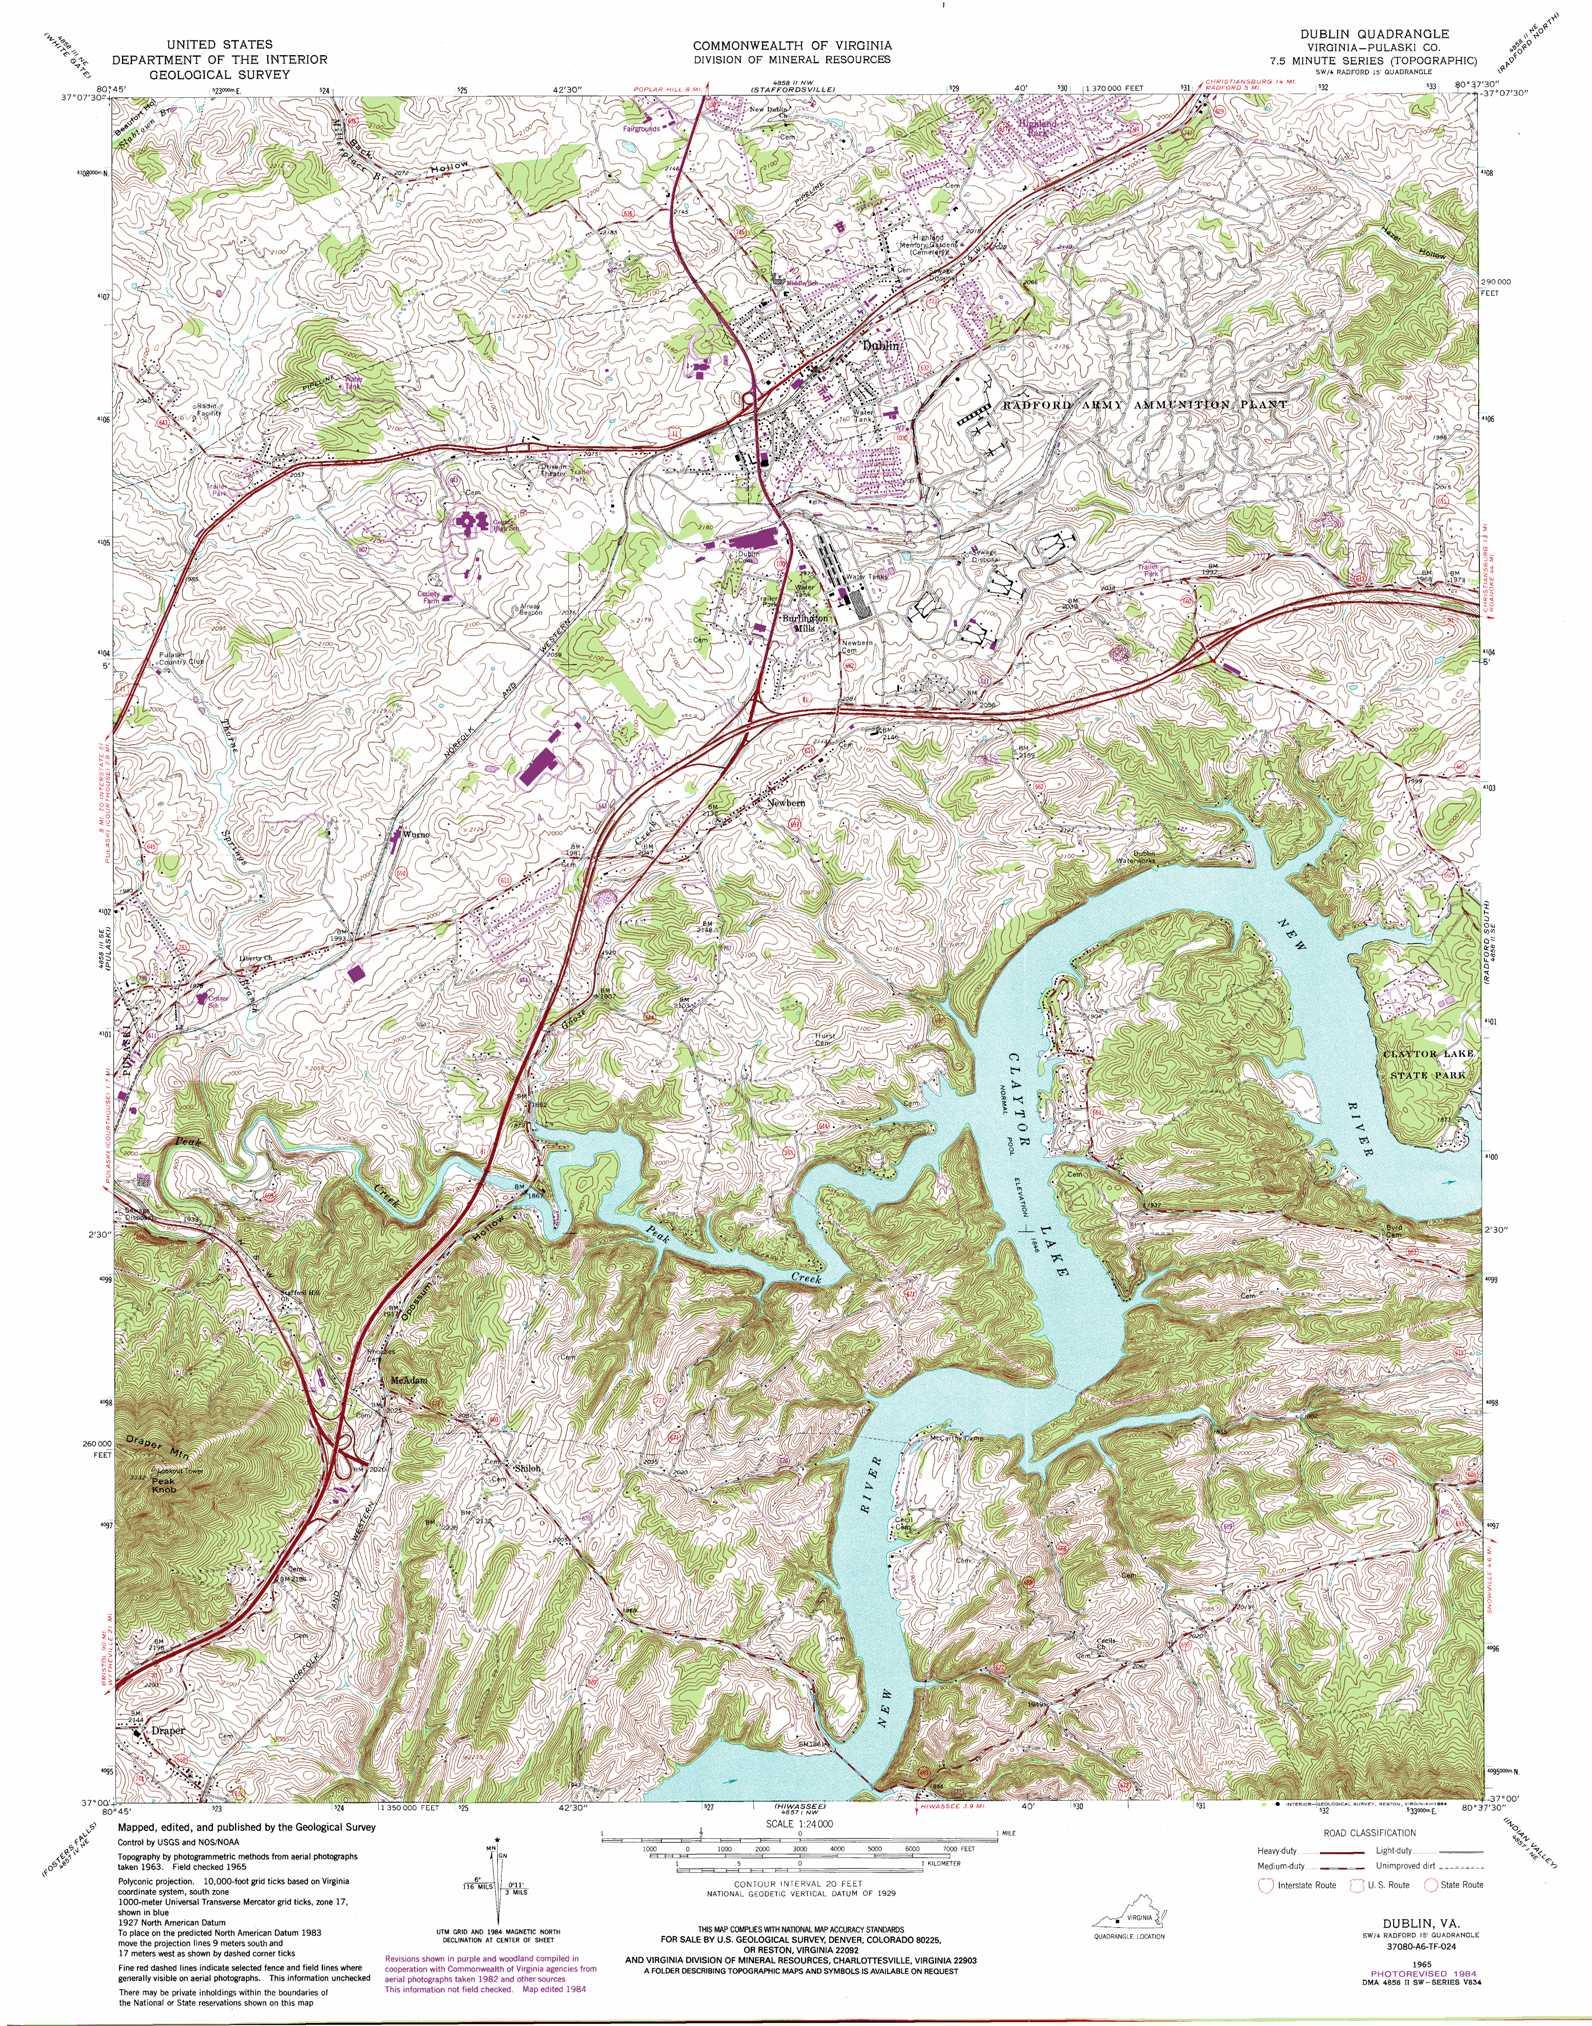 Dublin Topographic Map Va Usgs Topo Quad 37080a6